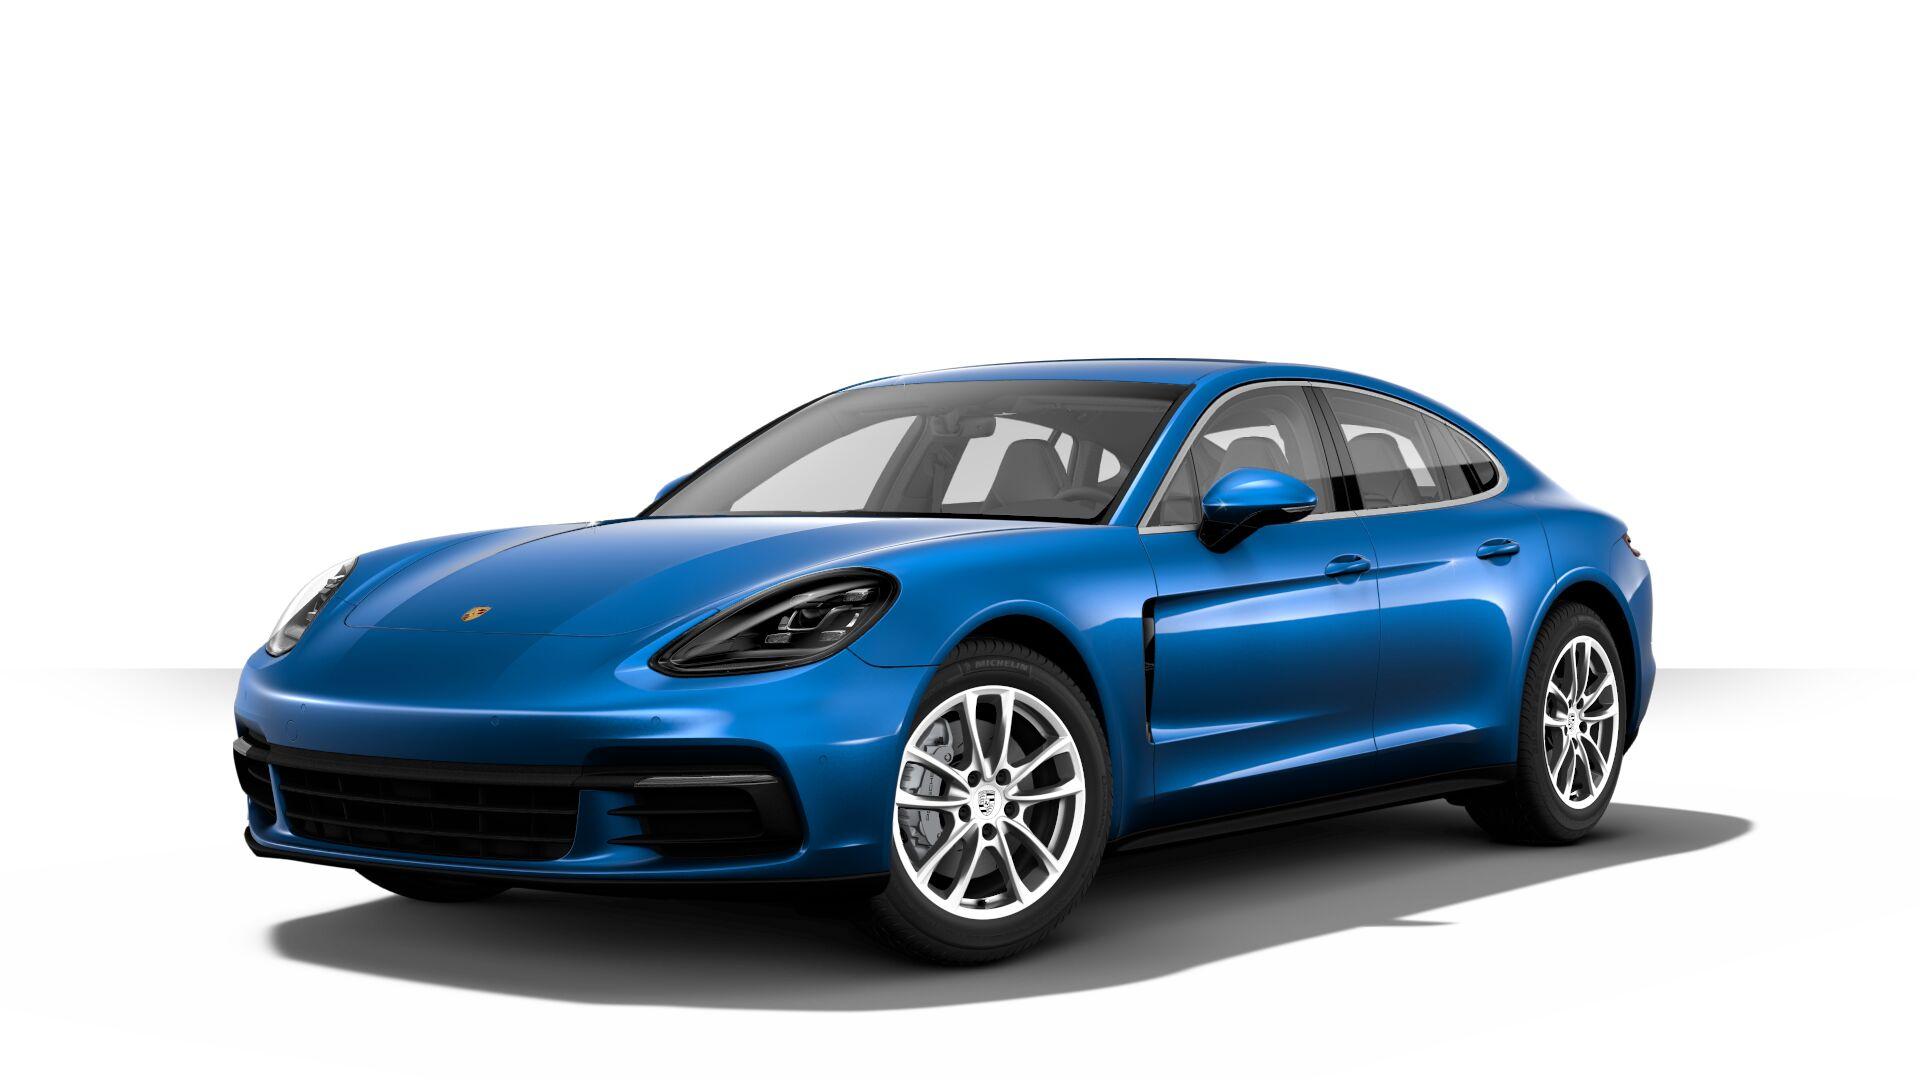 2017 Porsche Panamera Front View